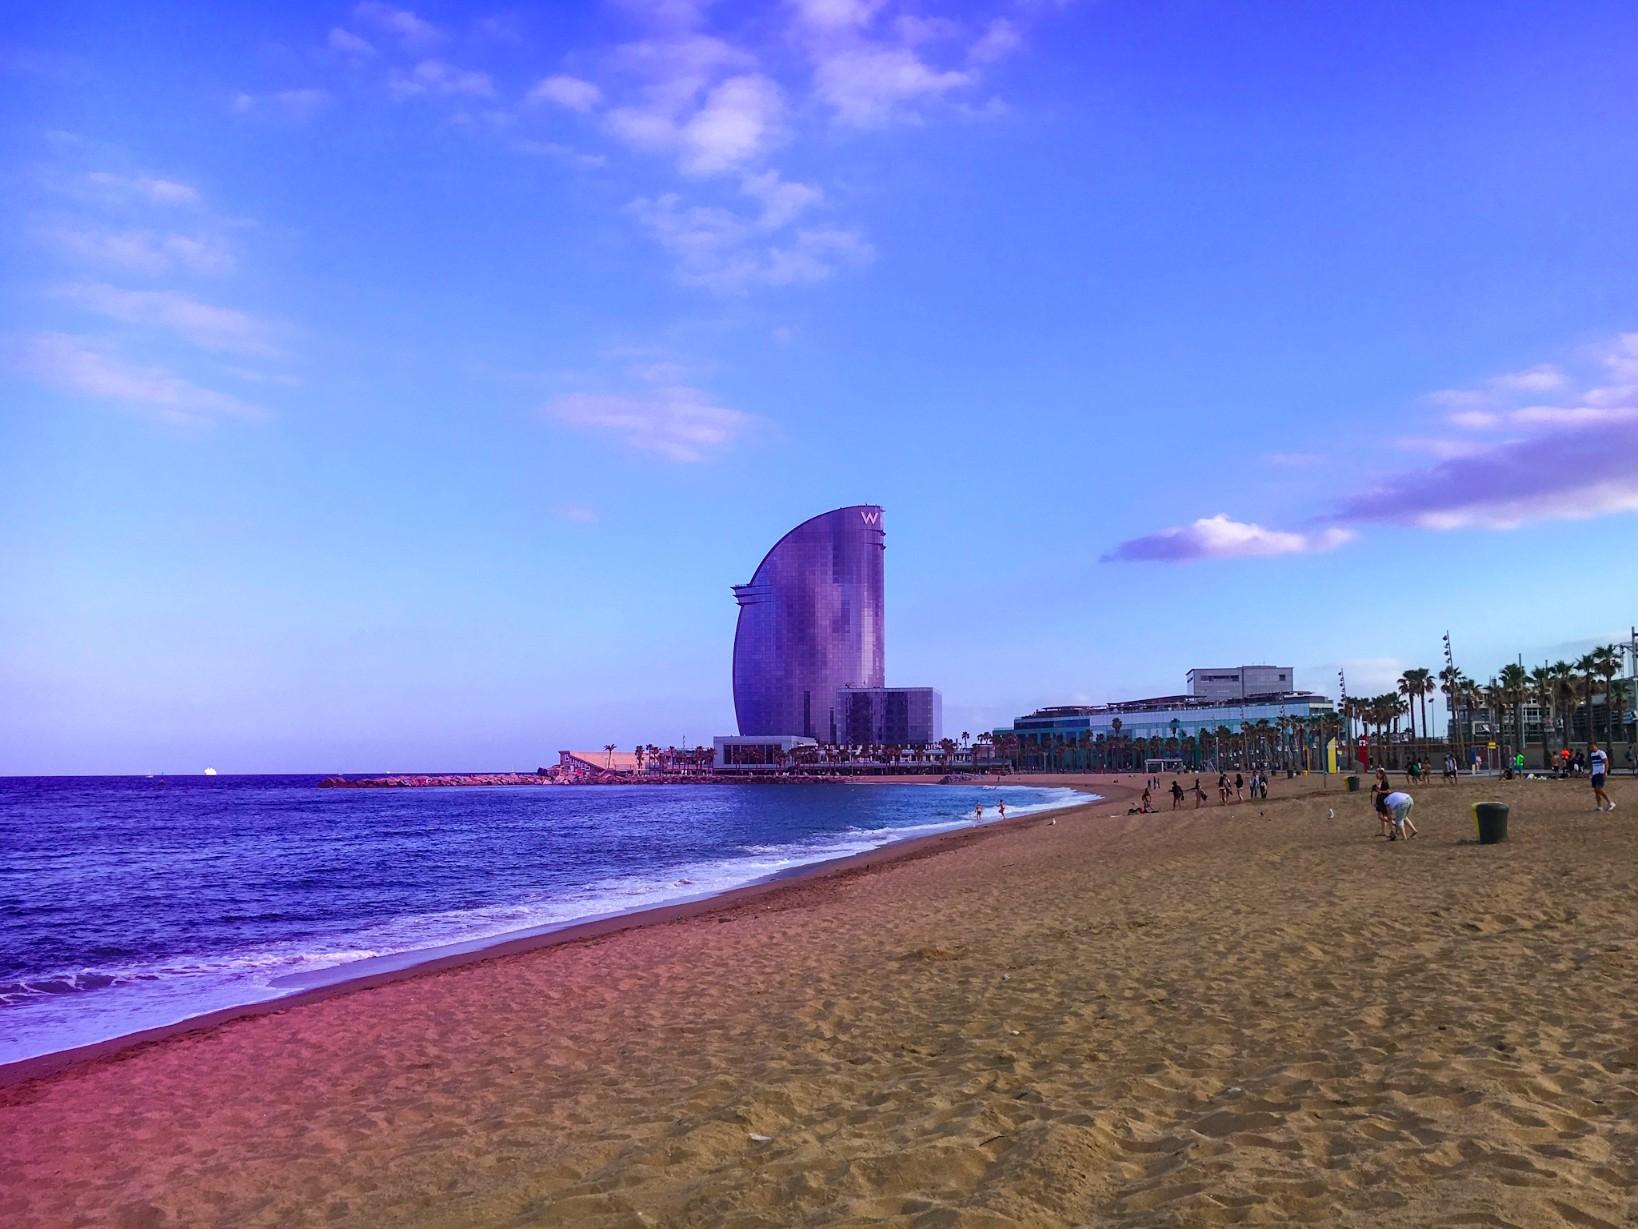 W Hotel Barceloneta Beach Barcelona